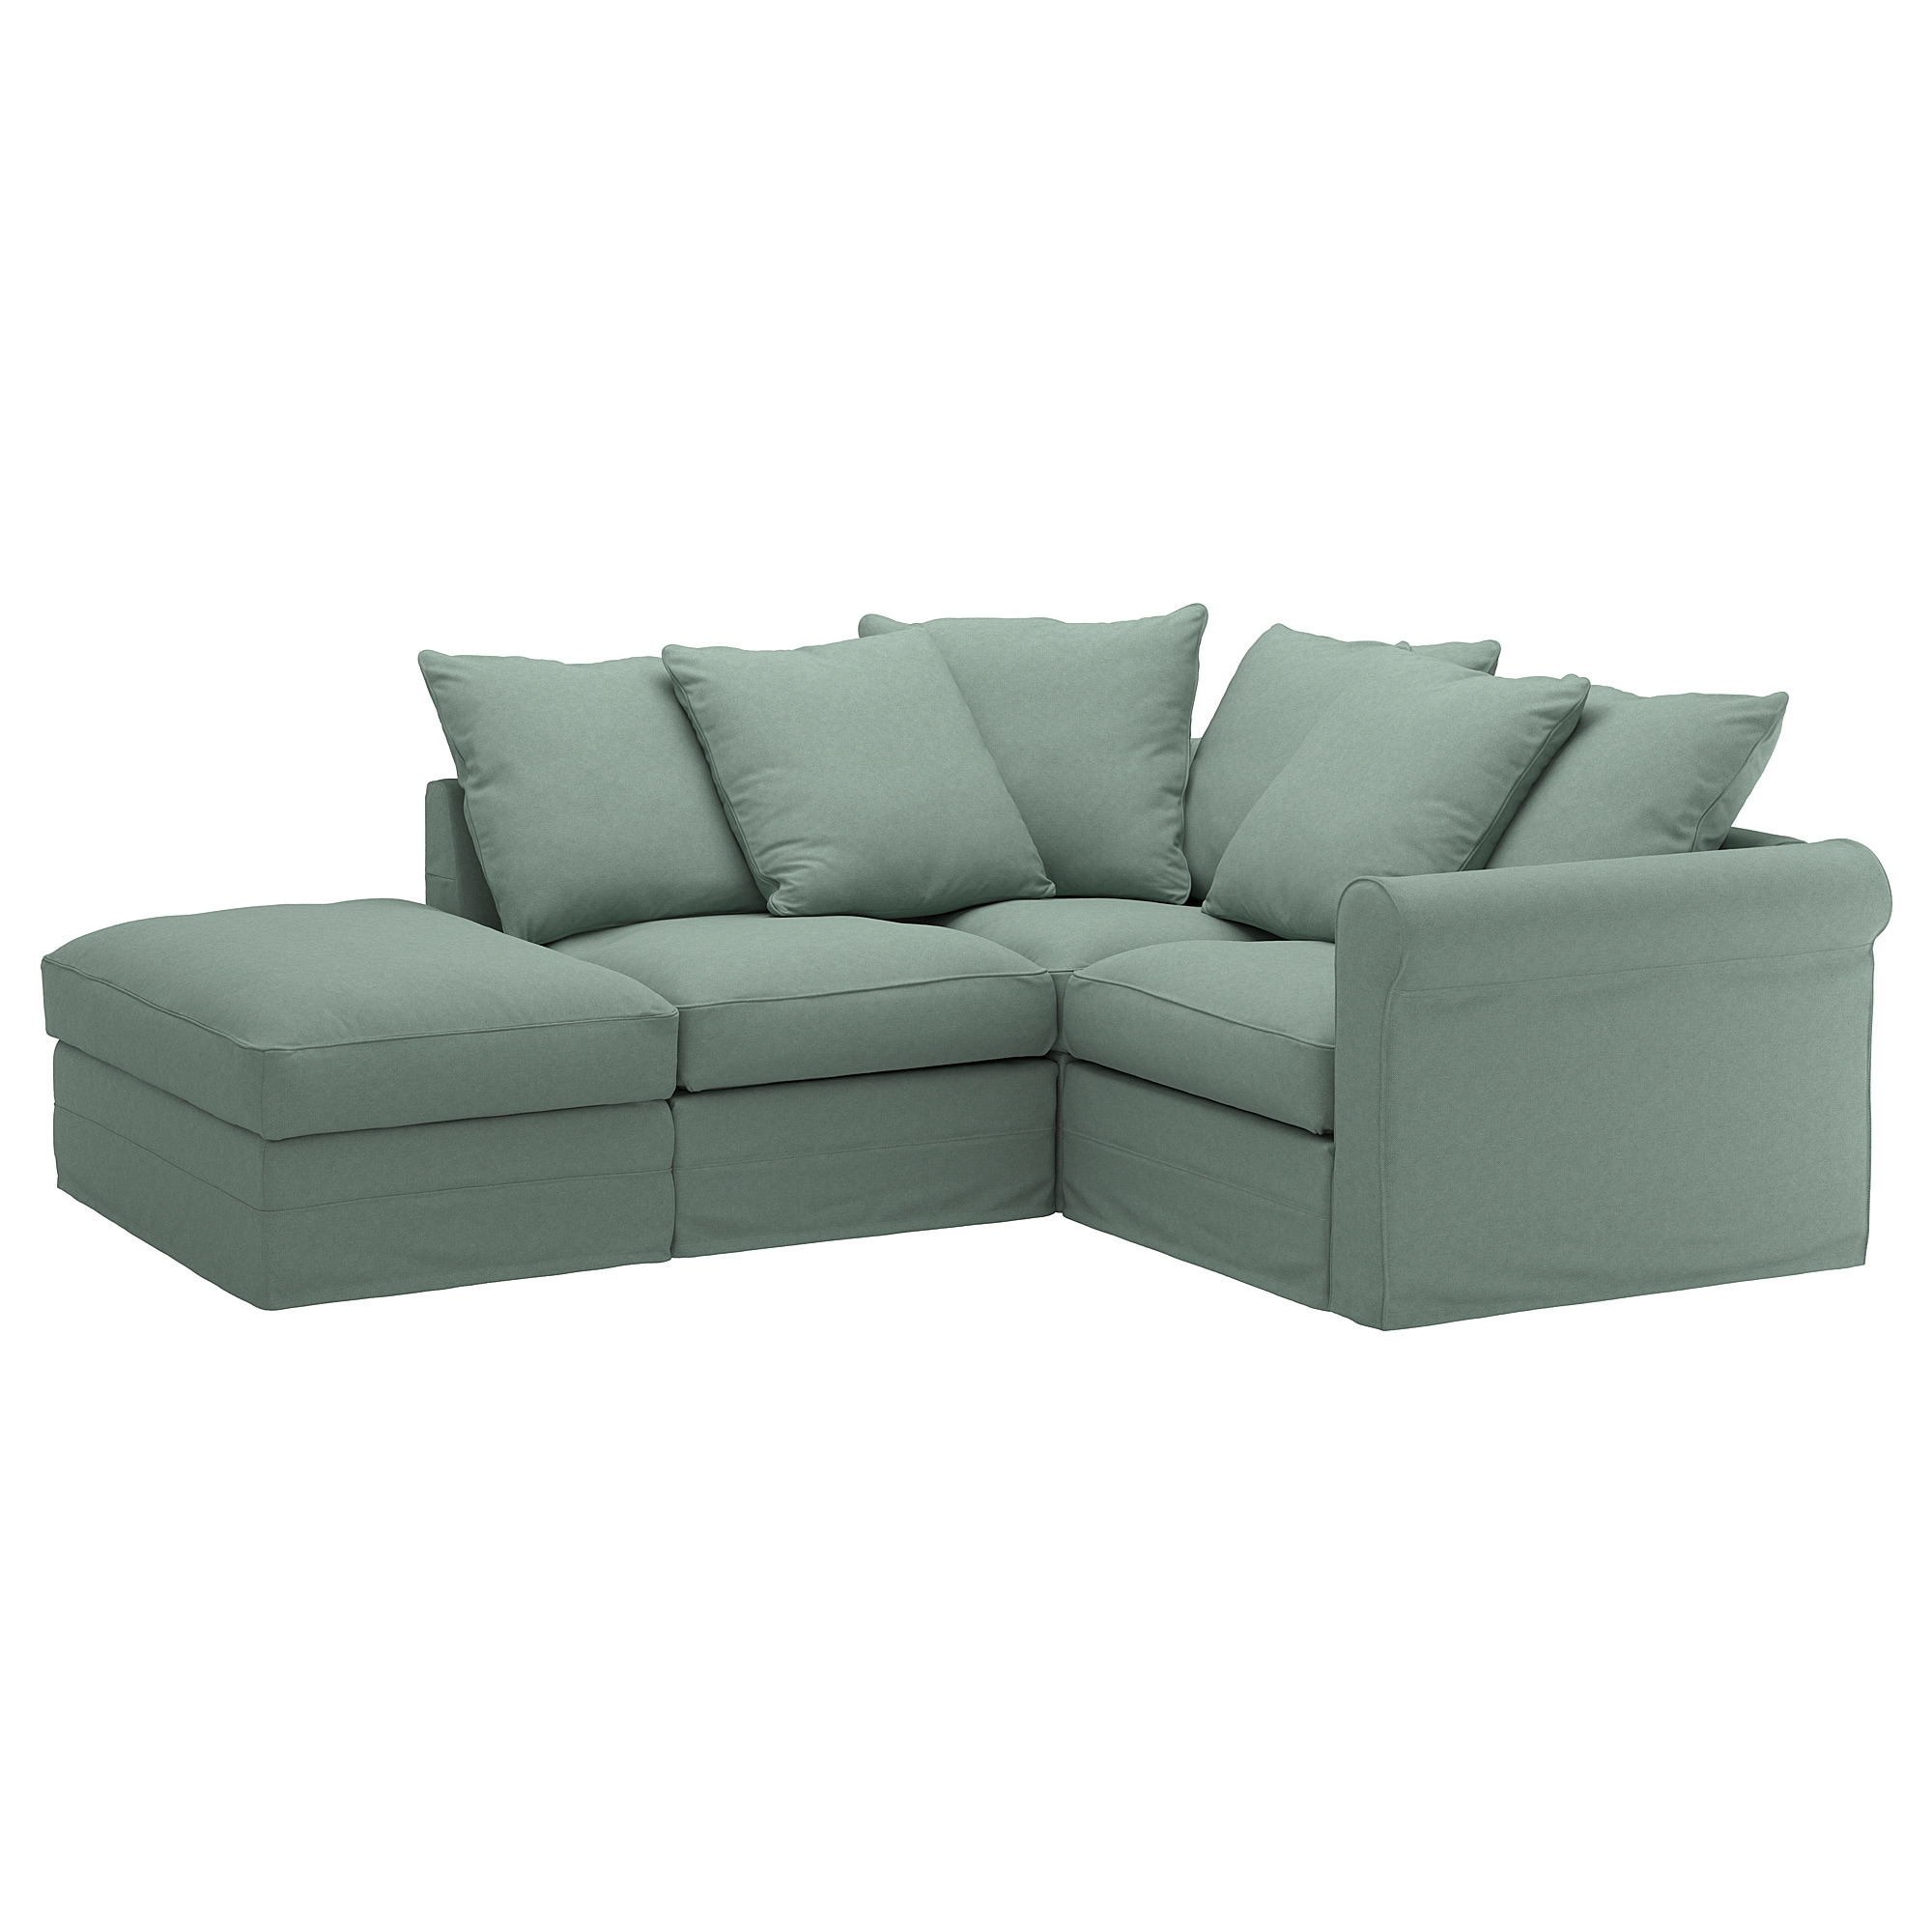 Sofa Tantra Ikea Xtd6 Fabric Corner sofas Ikea